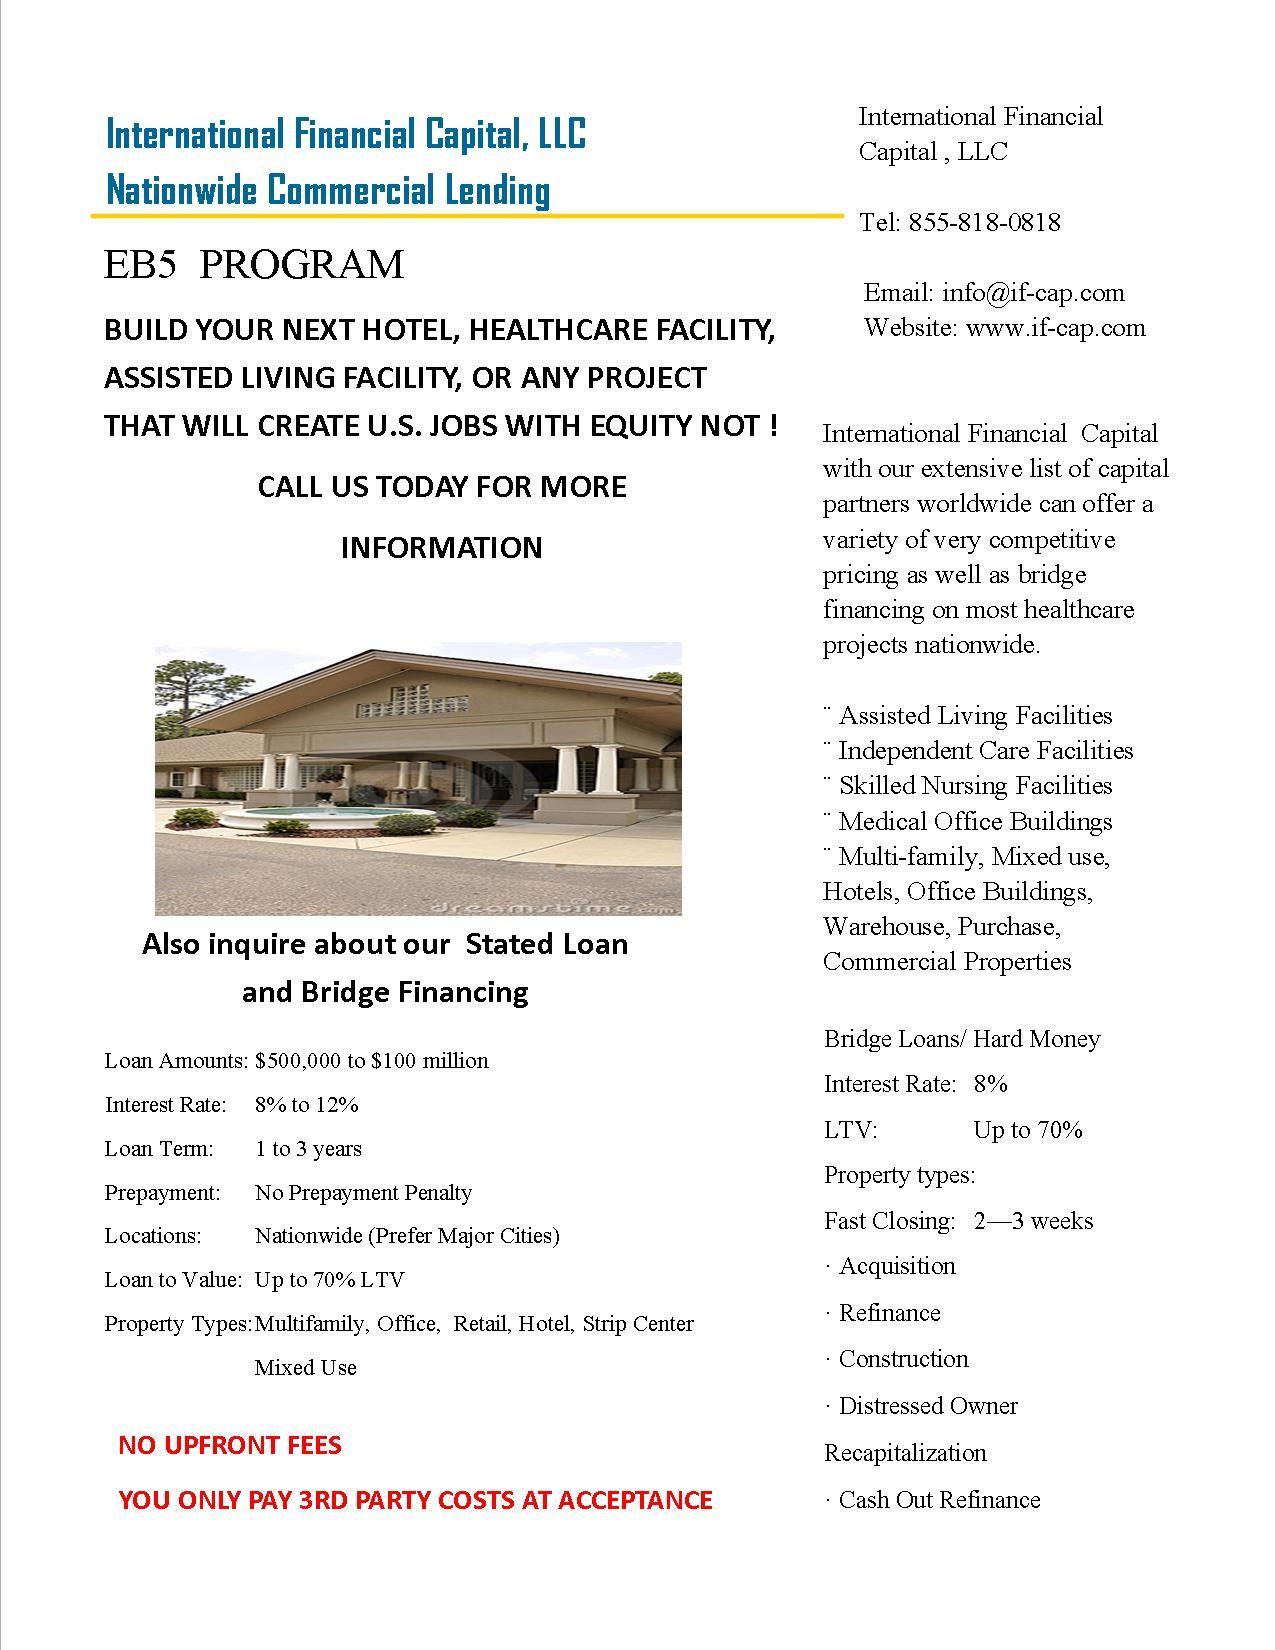 International Financial Capital Llc Nationwide Commercial Lending